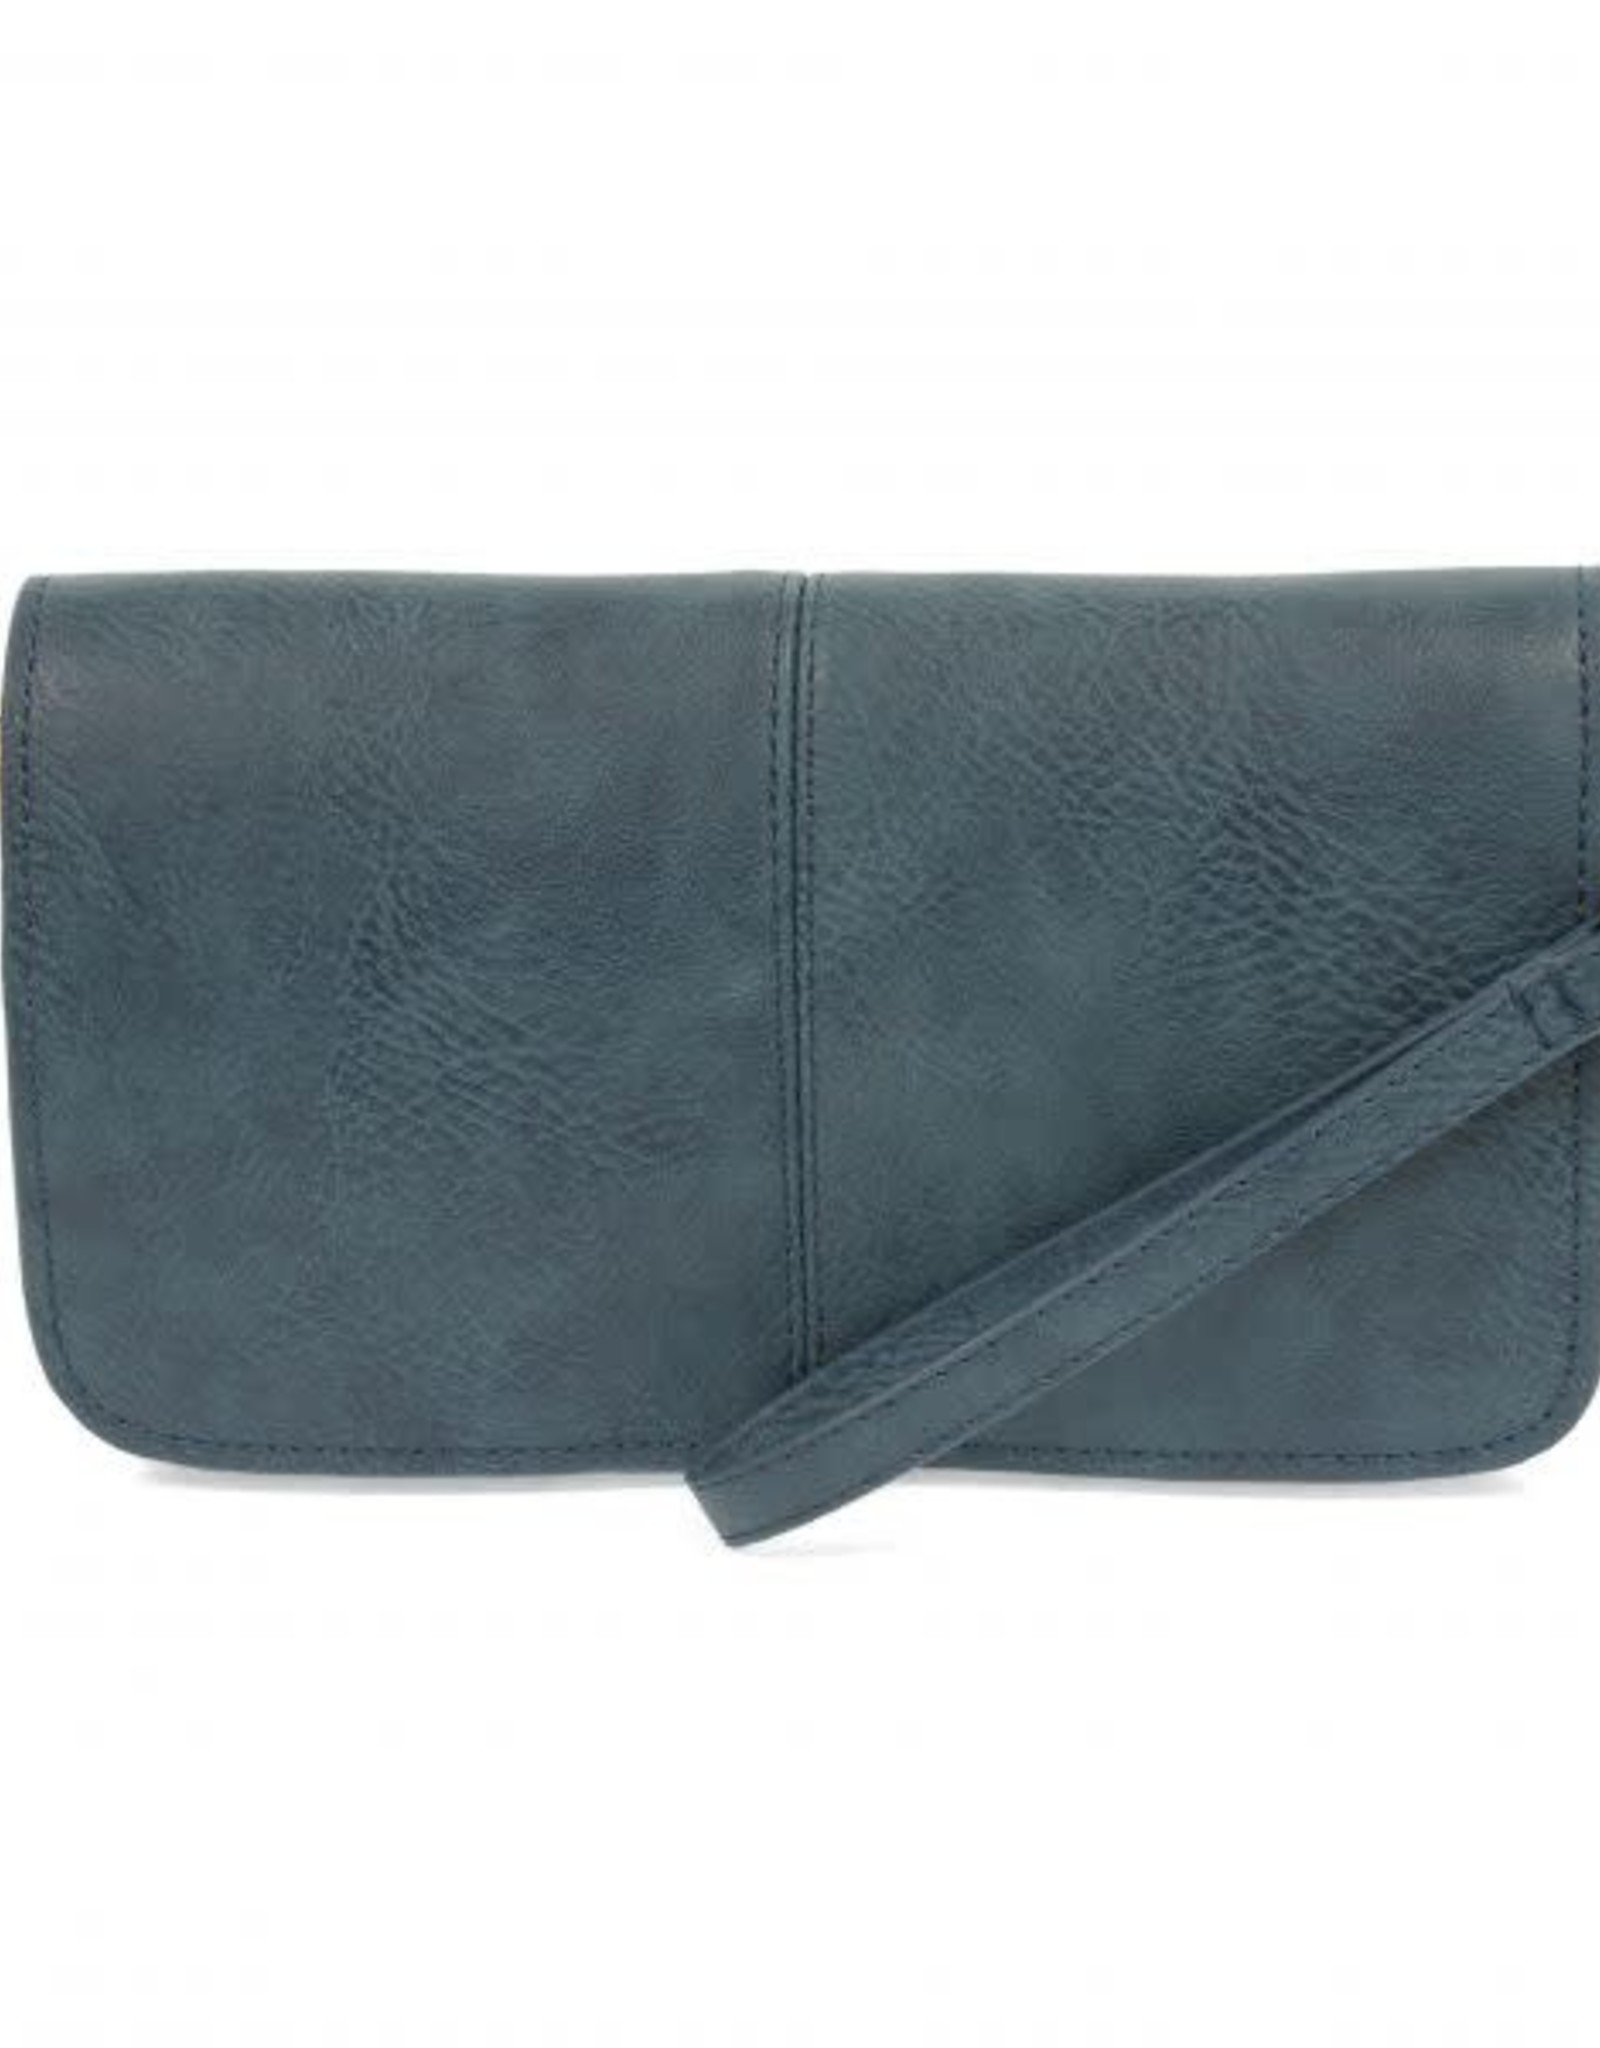 Joy Susan Mia Multi Pocket Crossbody Clutch-Dark Chambray